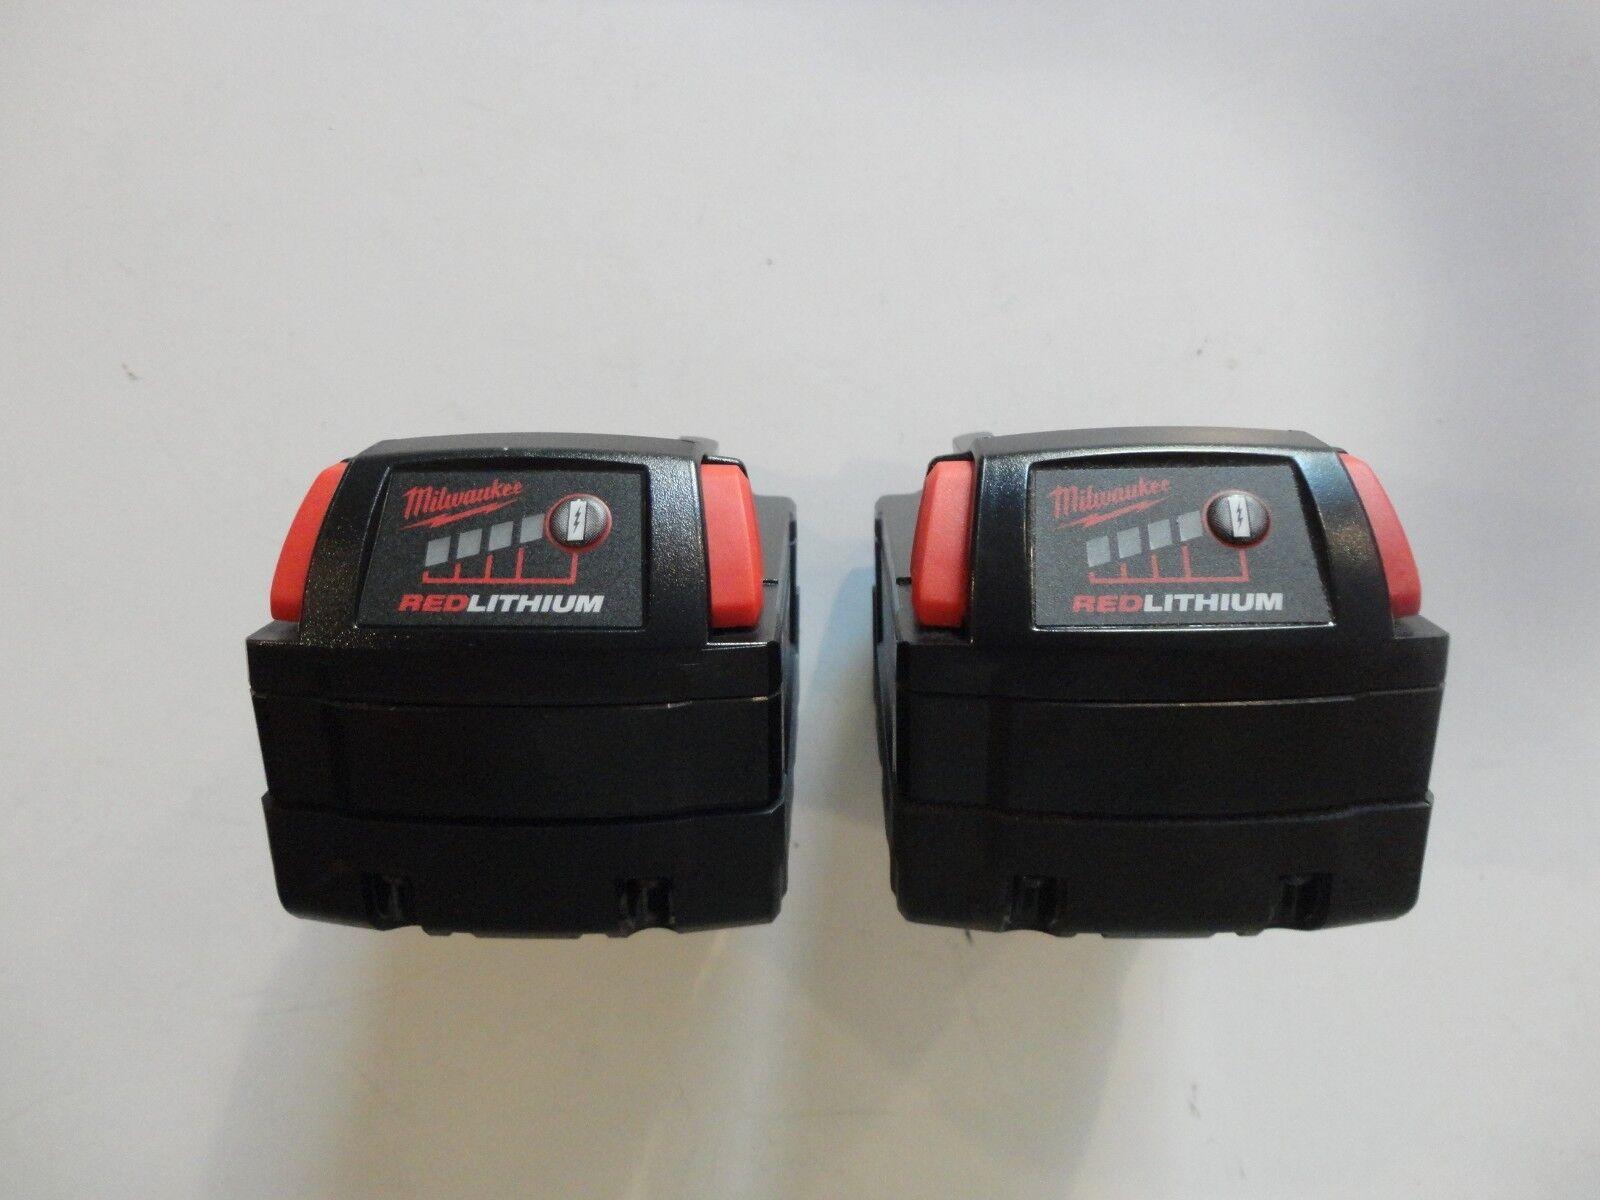 (2) MILWAUKEE 18V 18 Volt L i- Ion 48-11-1850 XC 5.0 AH Battery packs 48-11-1852 6